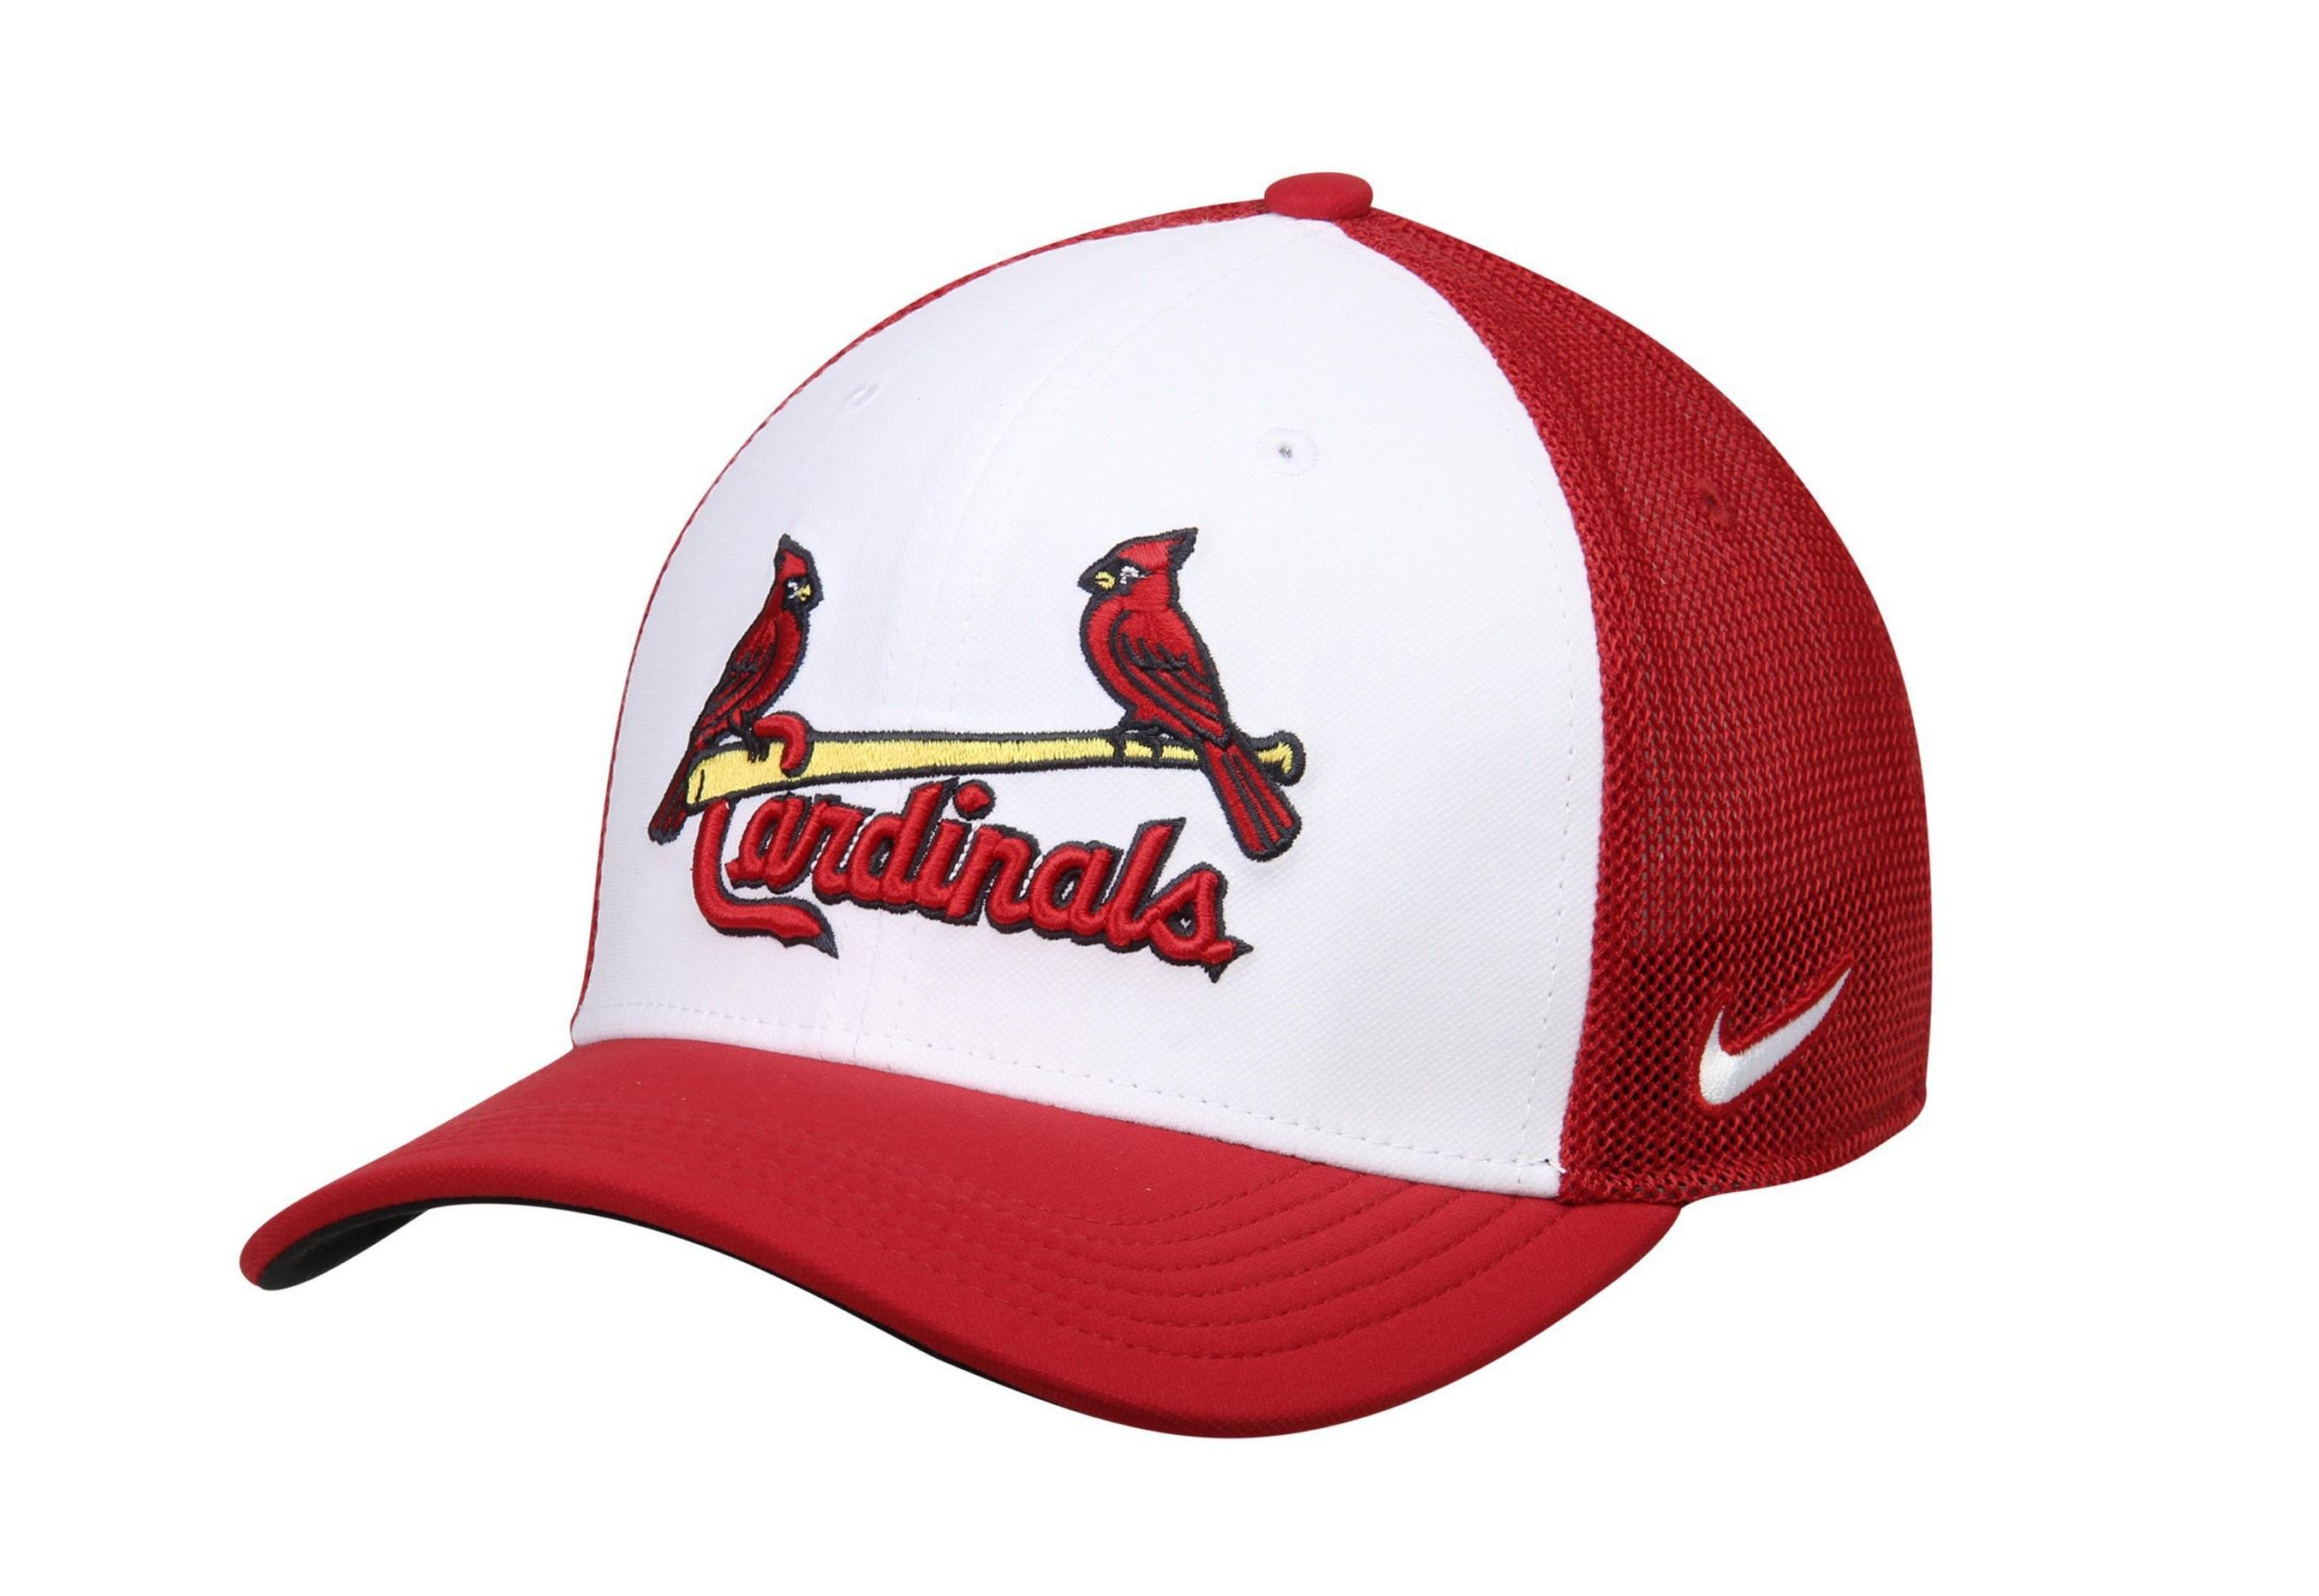 St Louis Cardinals High Definition Wallpapers